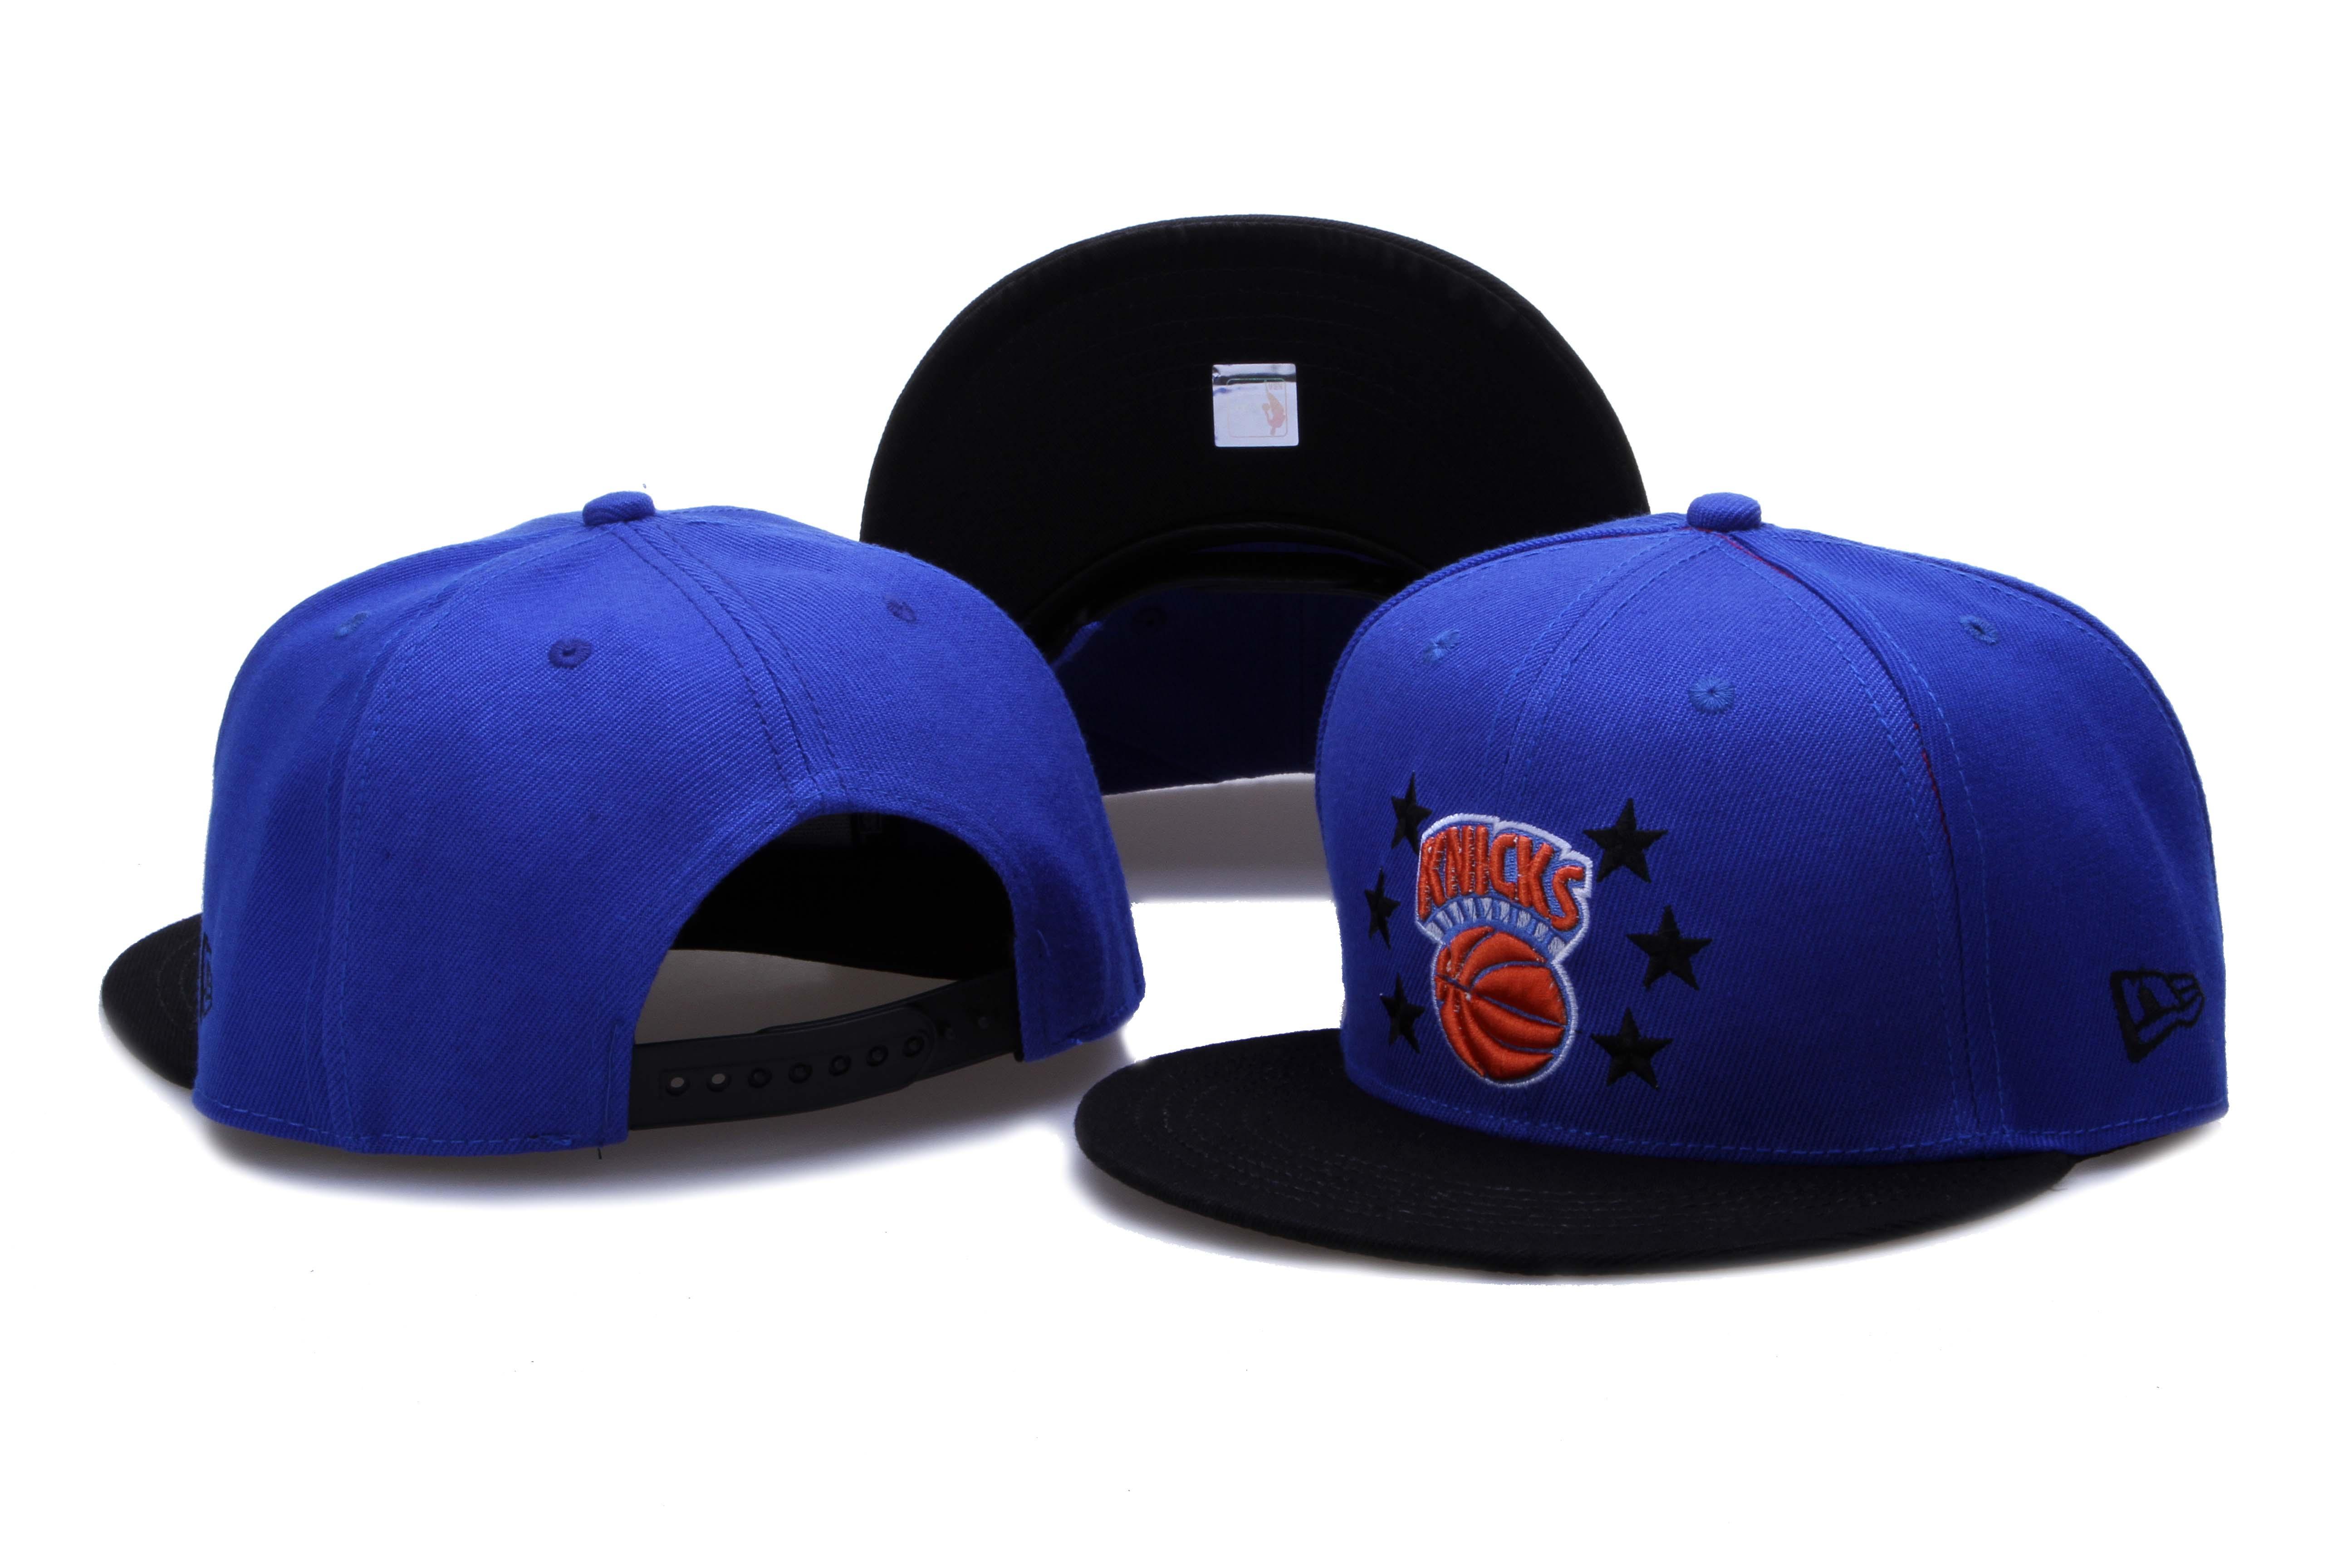 Knicks Team Logo Blue Black Adjustable Hat LH